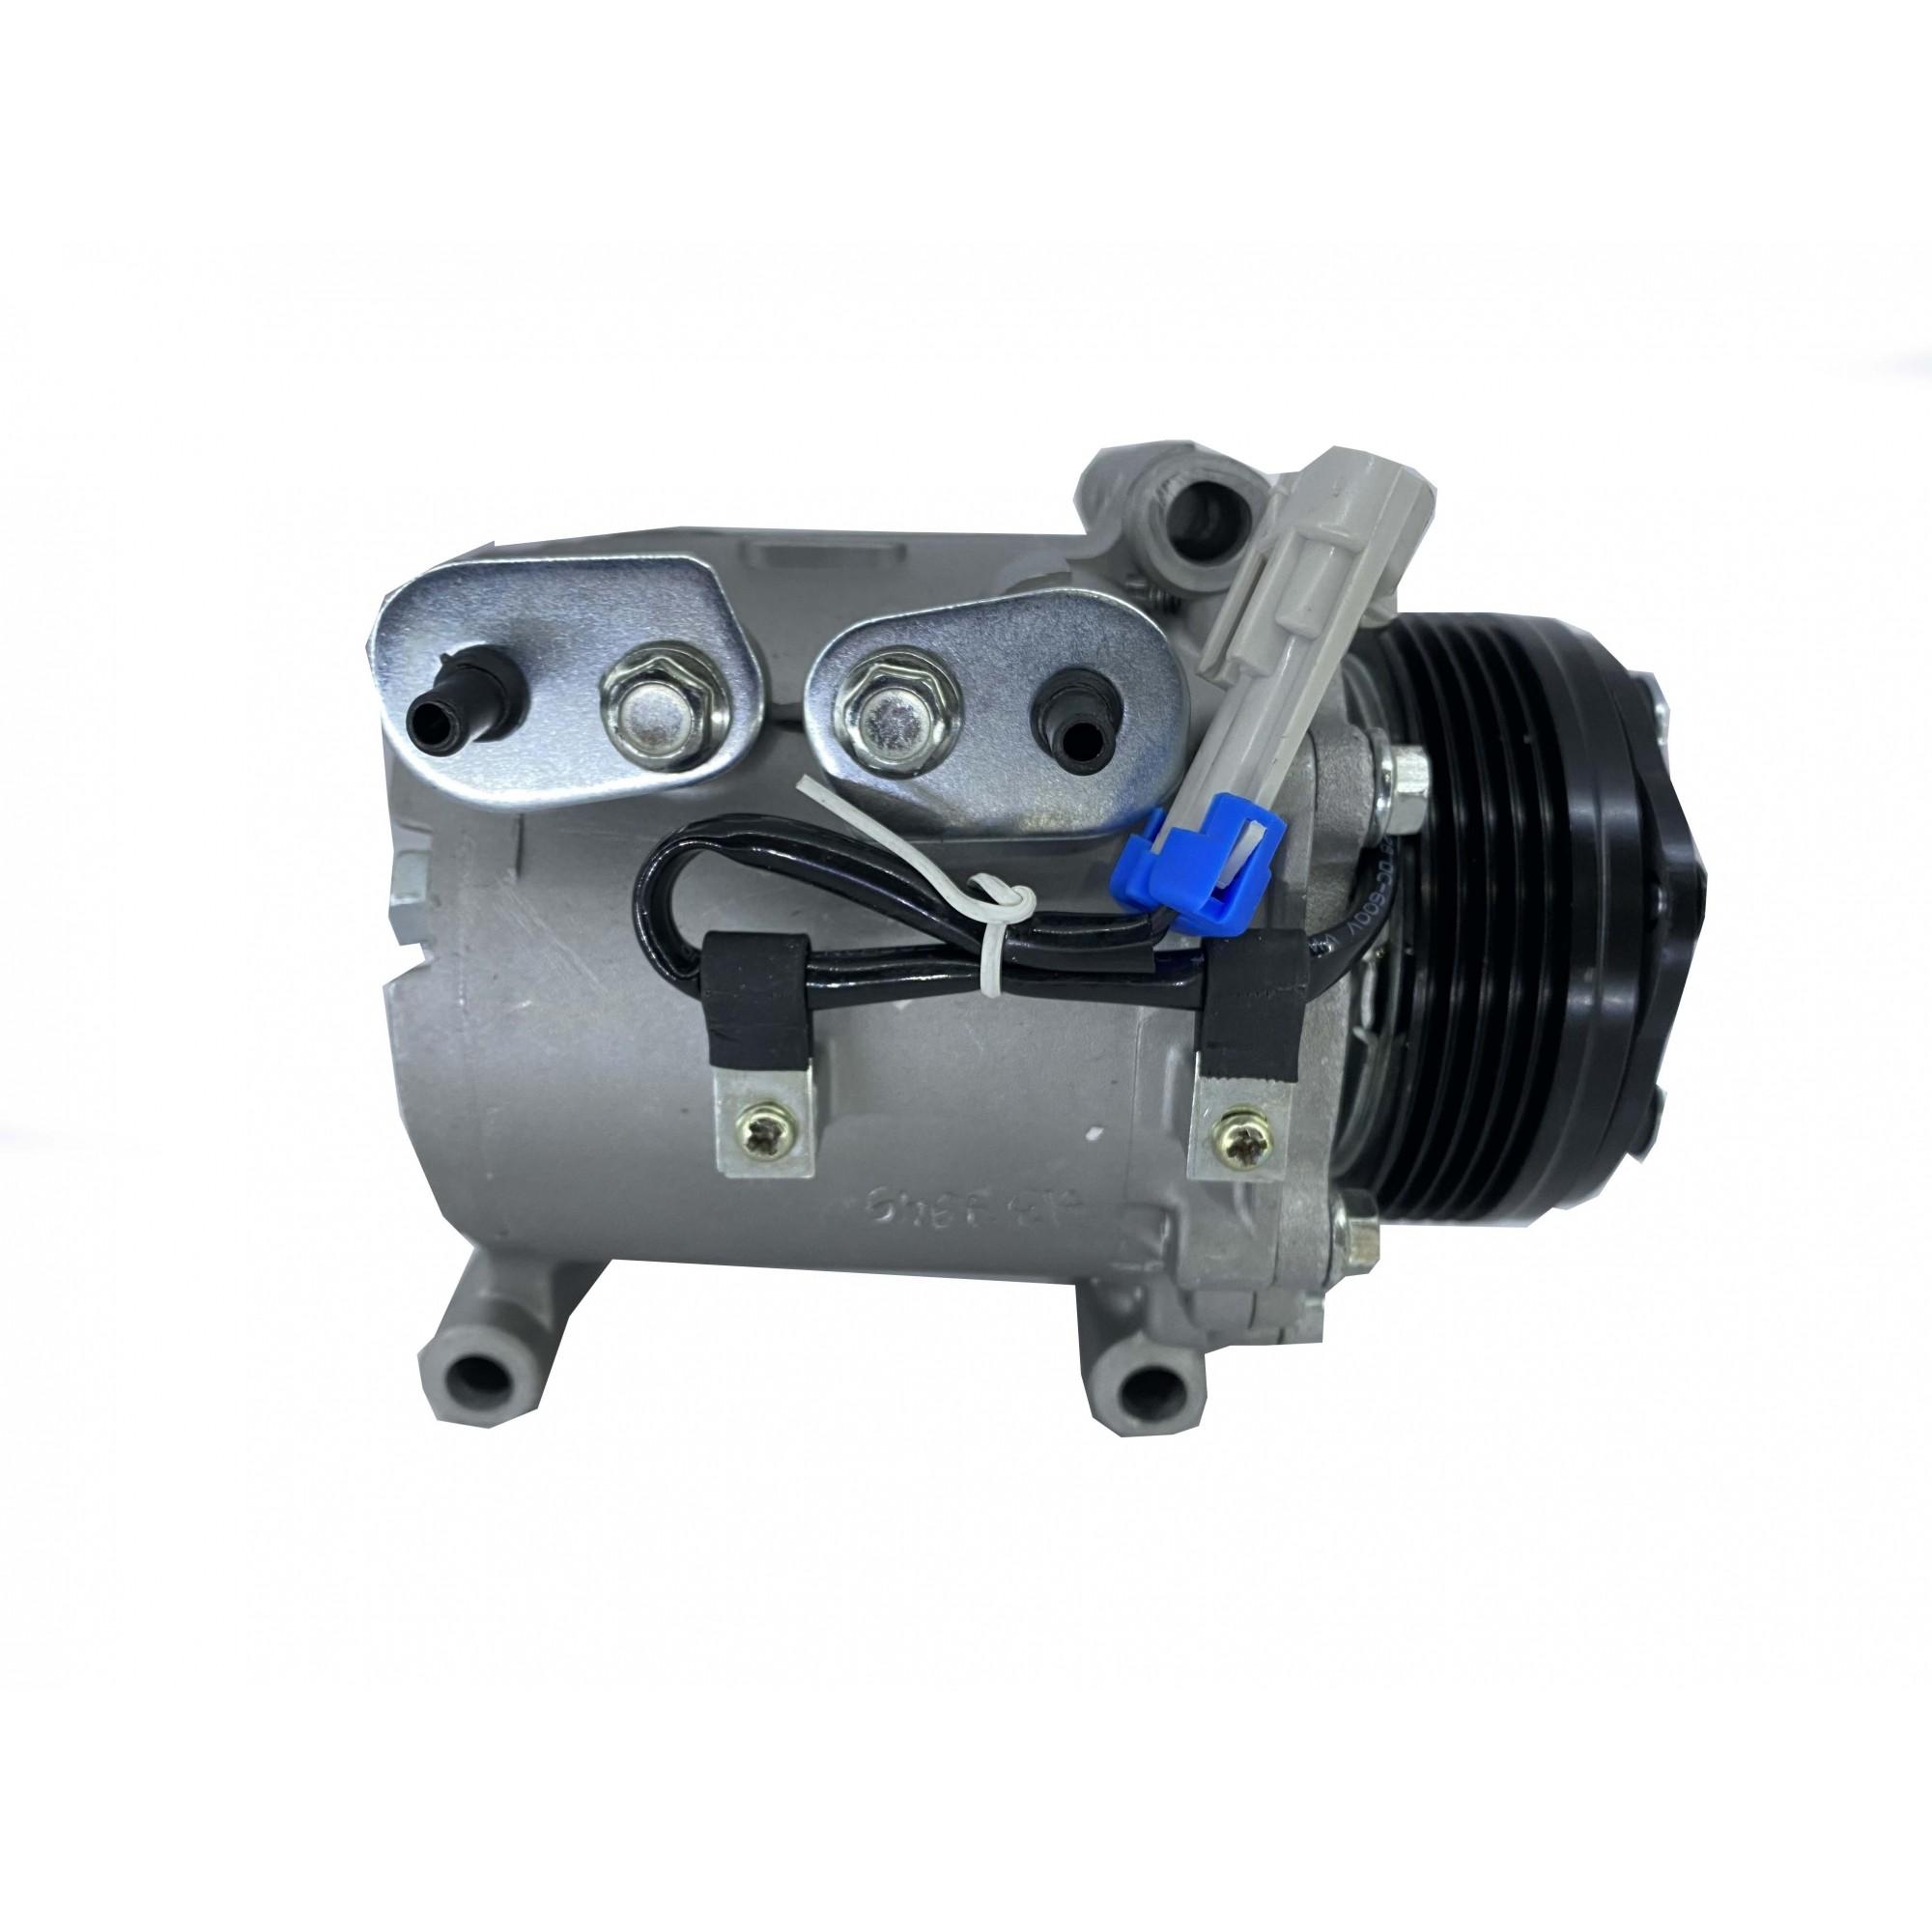 Compressor Ar Condicionado Fiat Grand Siena / Doblo 1.4